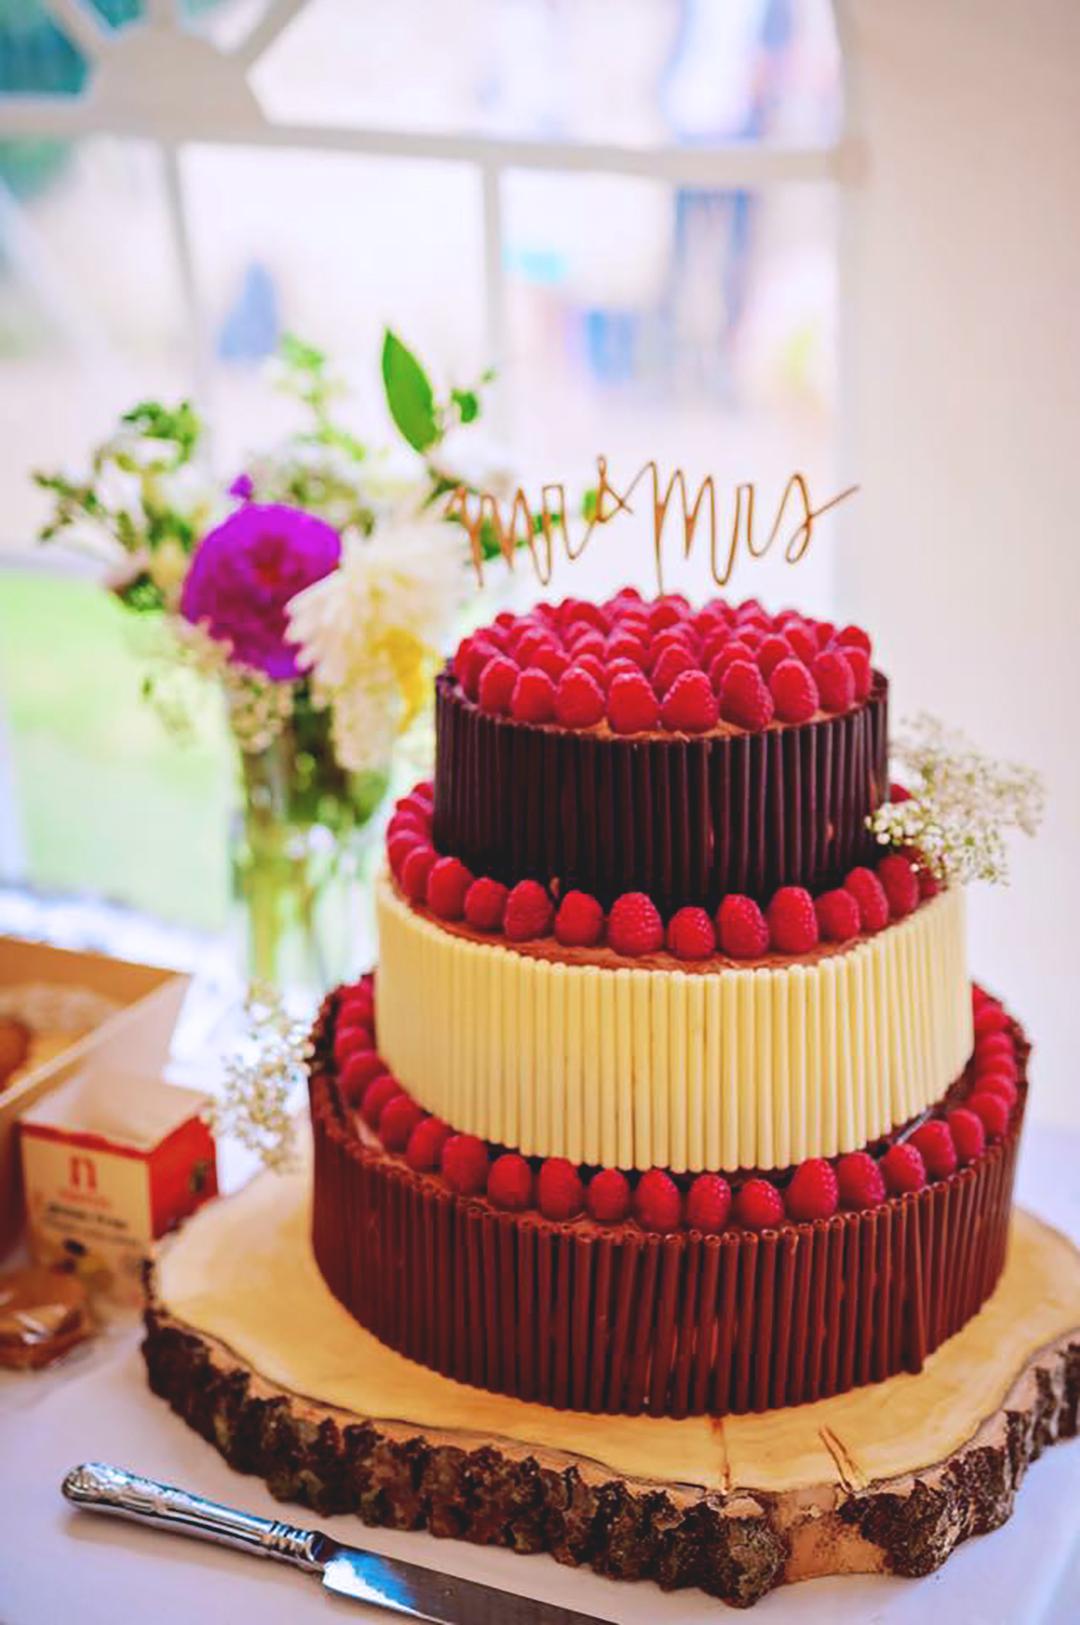 chocolate and raspberries copy